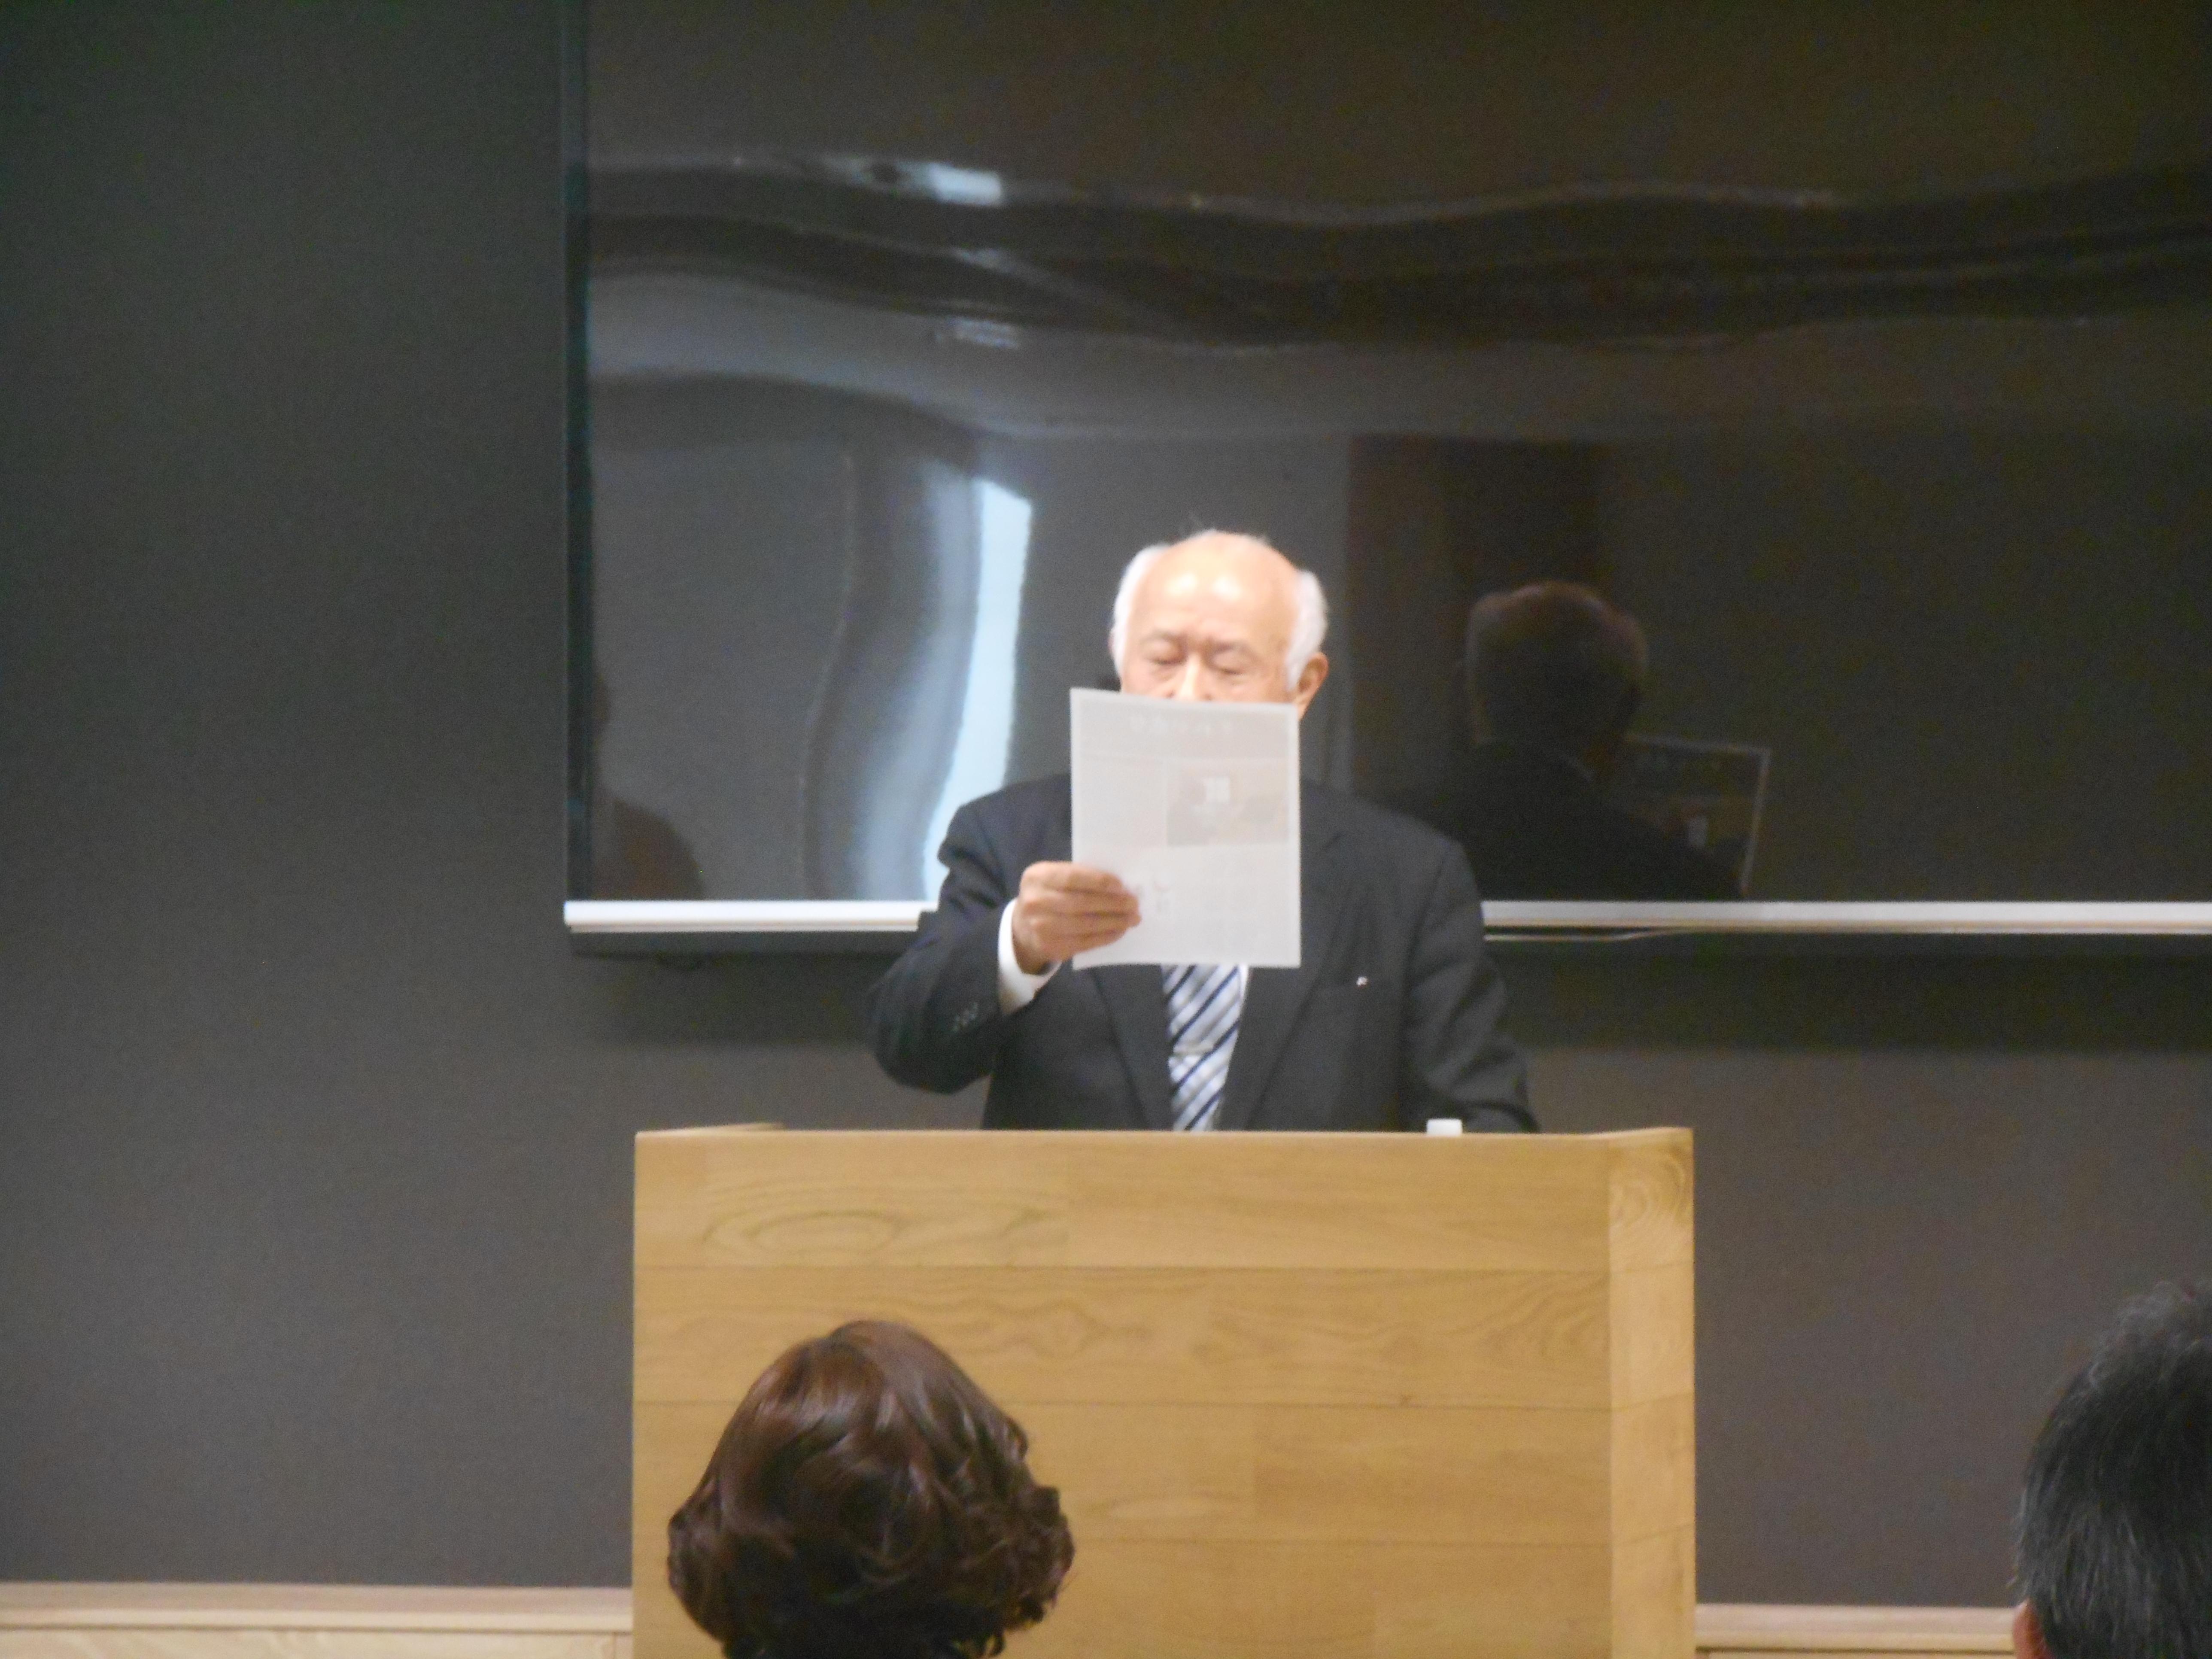 DSCN0425 - 平成30年度 東京思風塾 4月7日(土)「時代が問題をつくり、問題が人物をつくる」